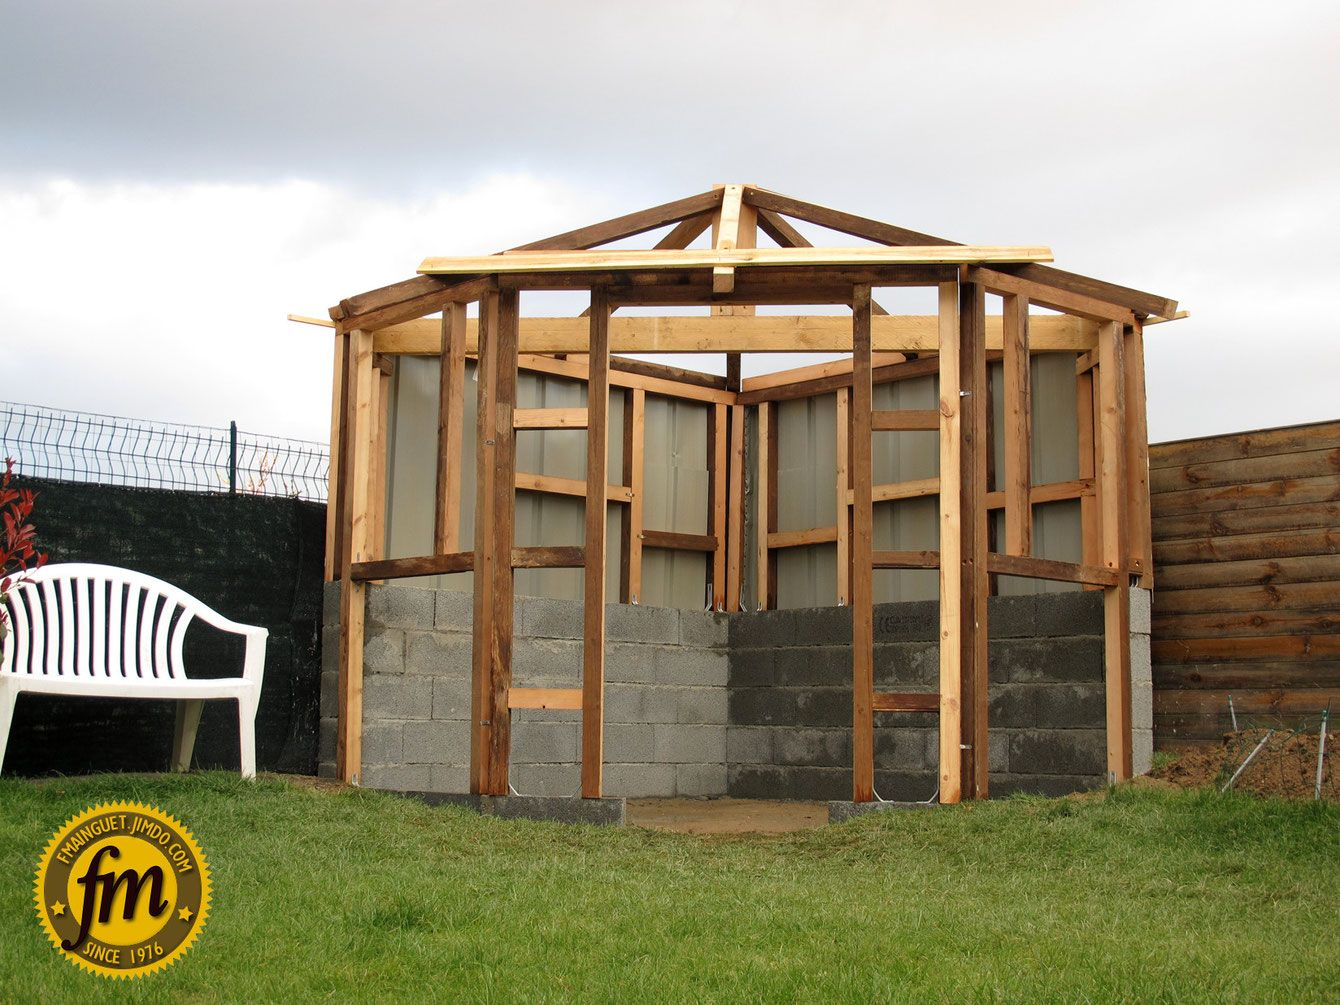 Charpente cabane de jardin d\'angle | jardin | Pinterest | Construction